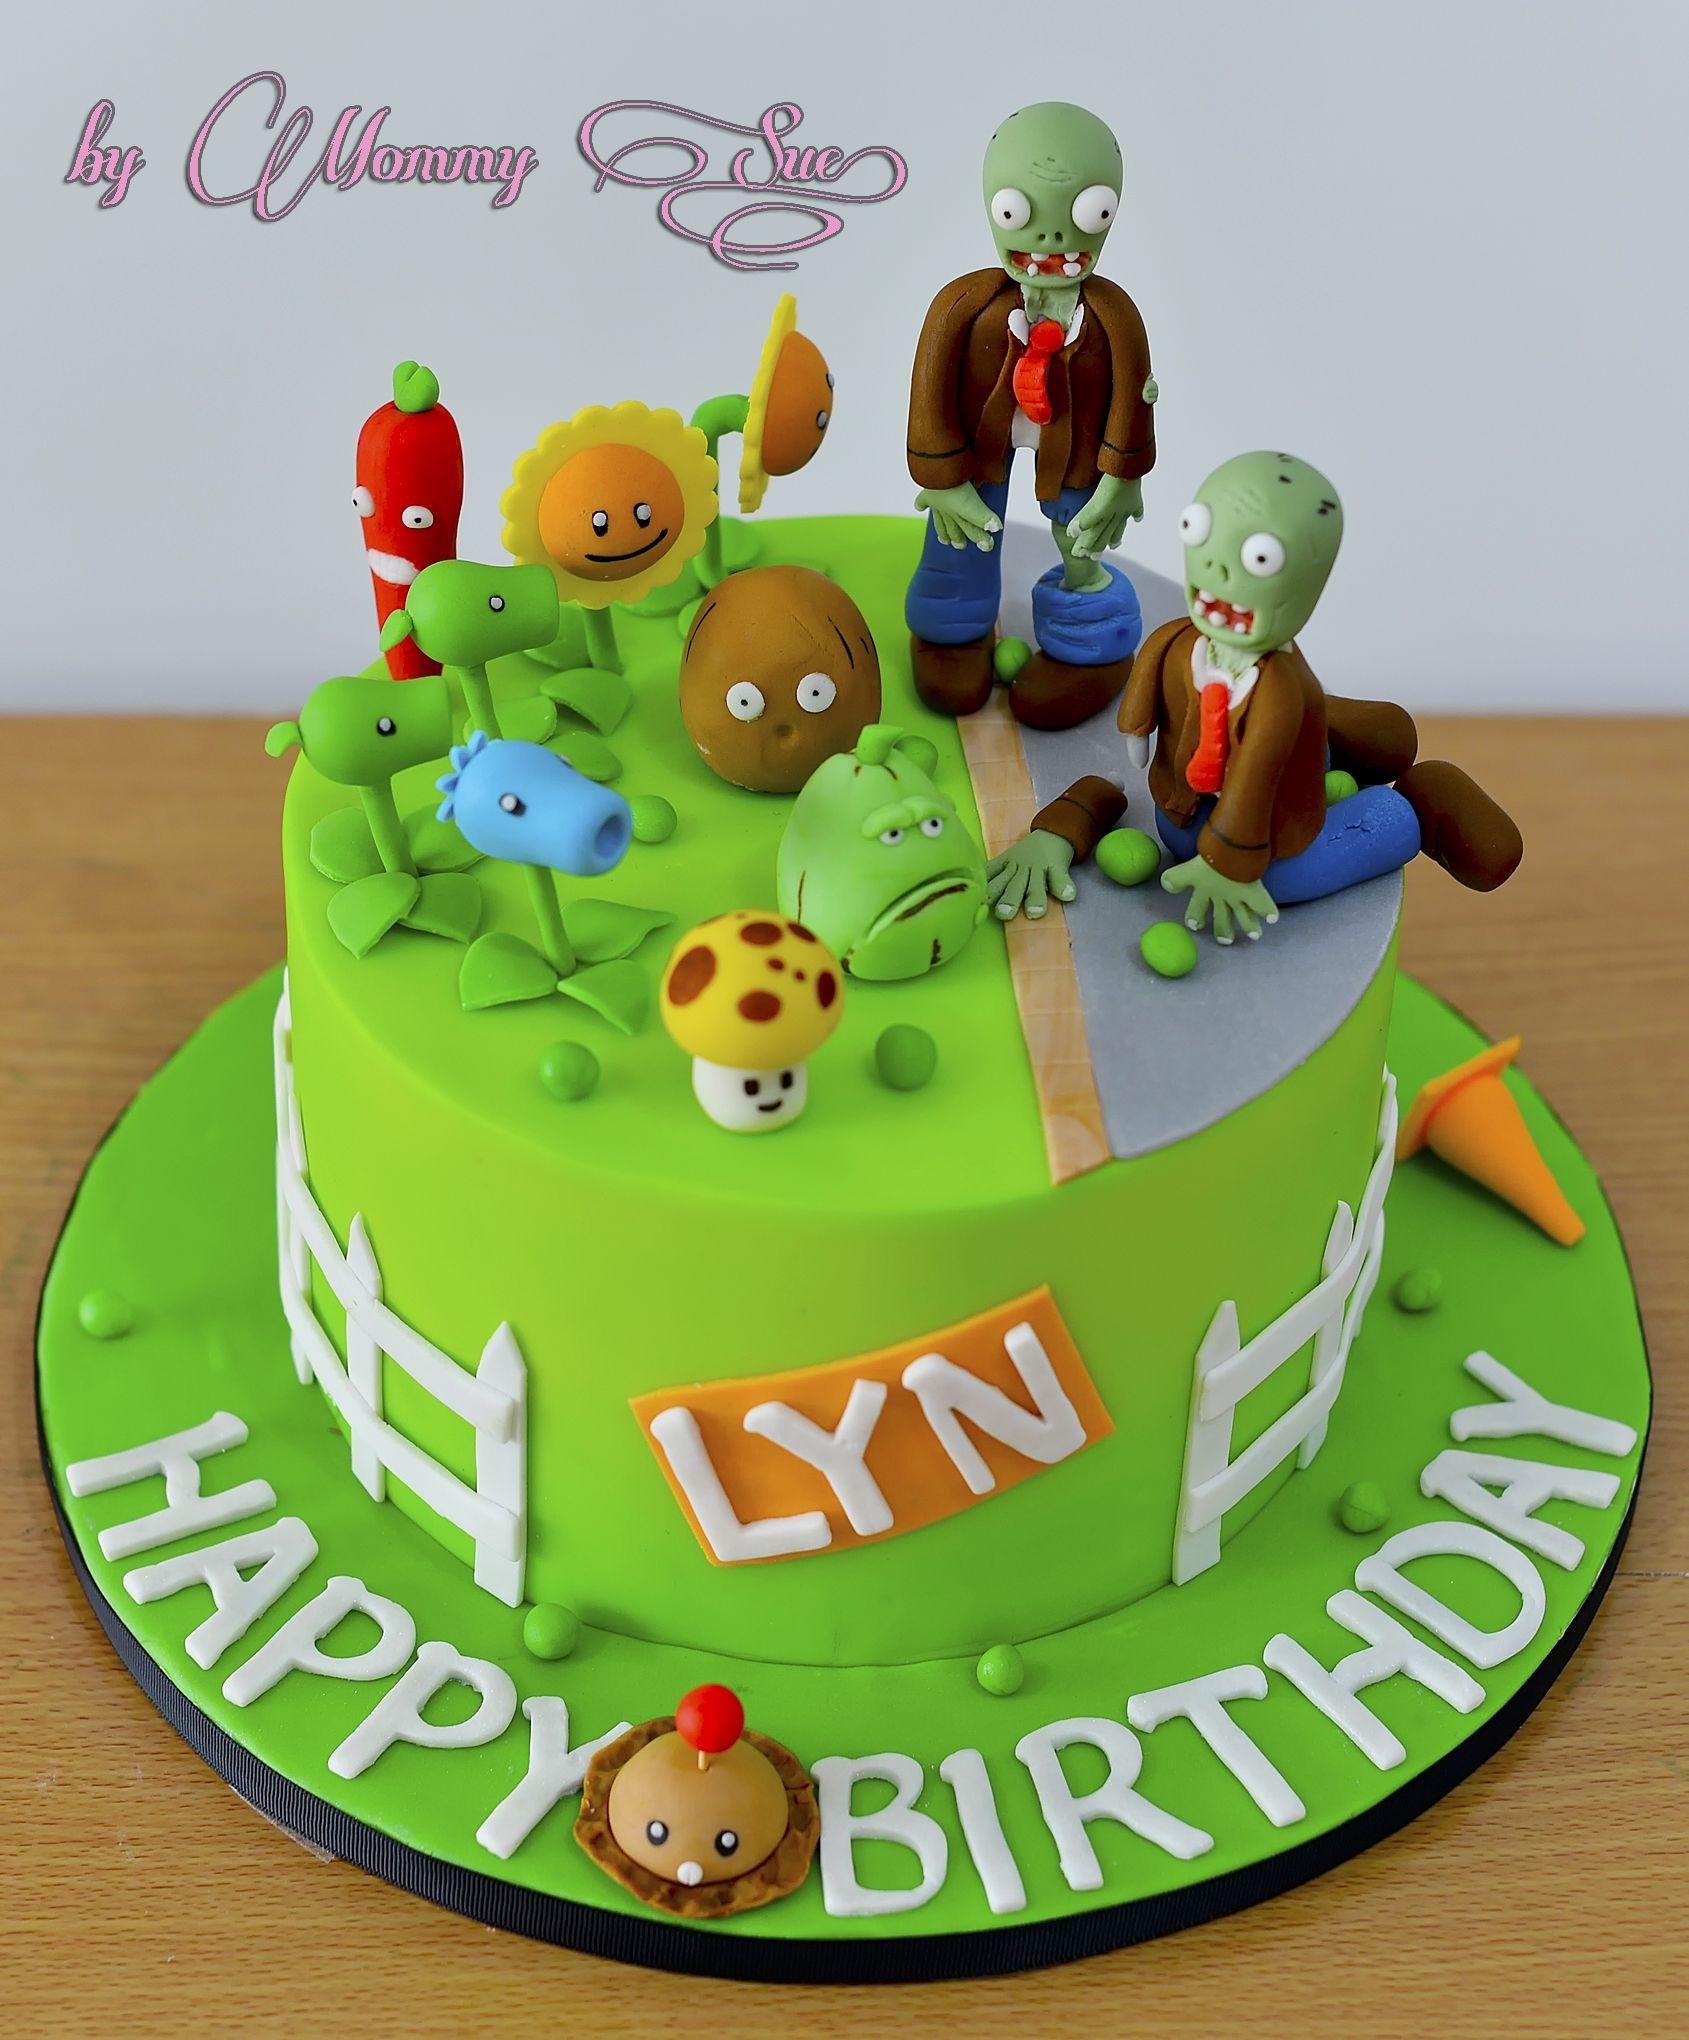 Plants Vs Zombies Cake Birthday Cake For Boys Pinterest Plants